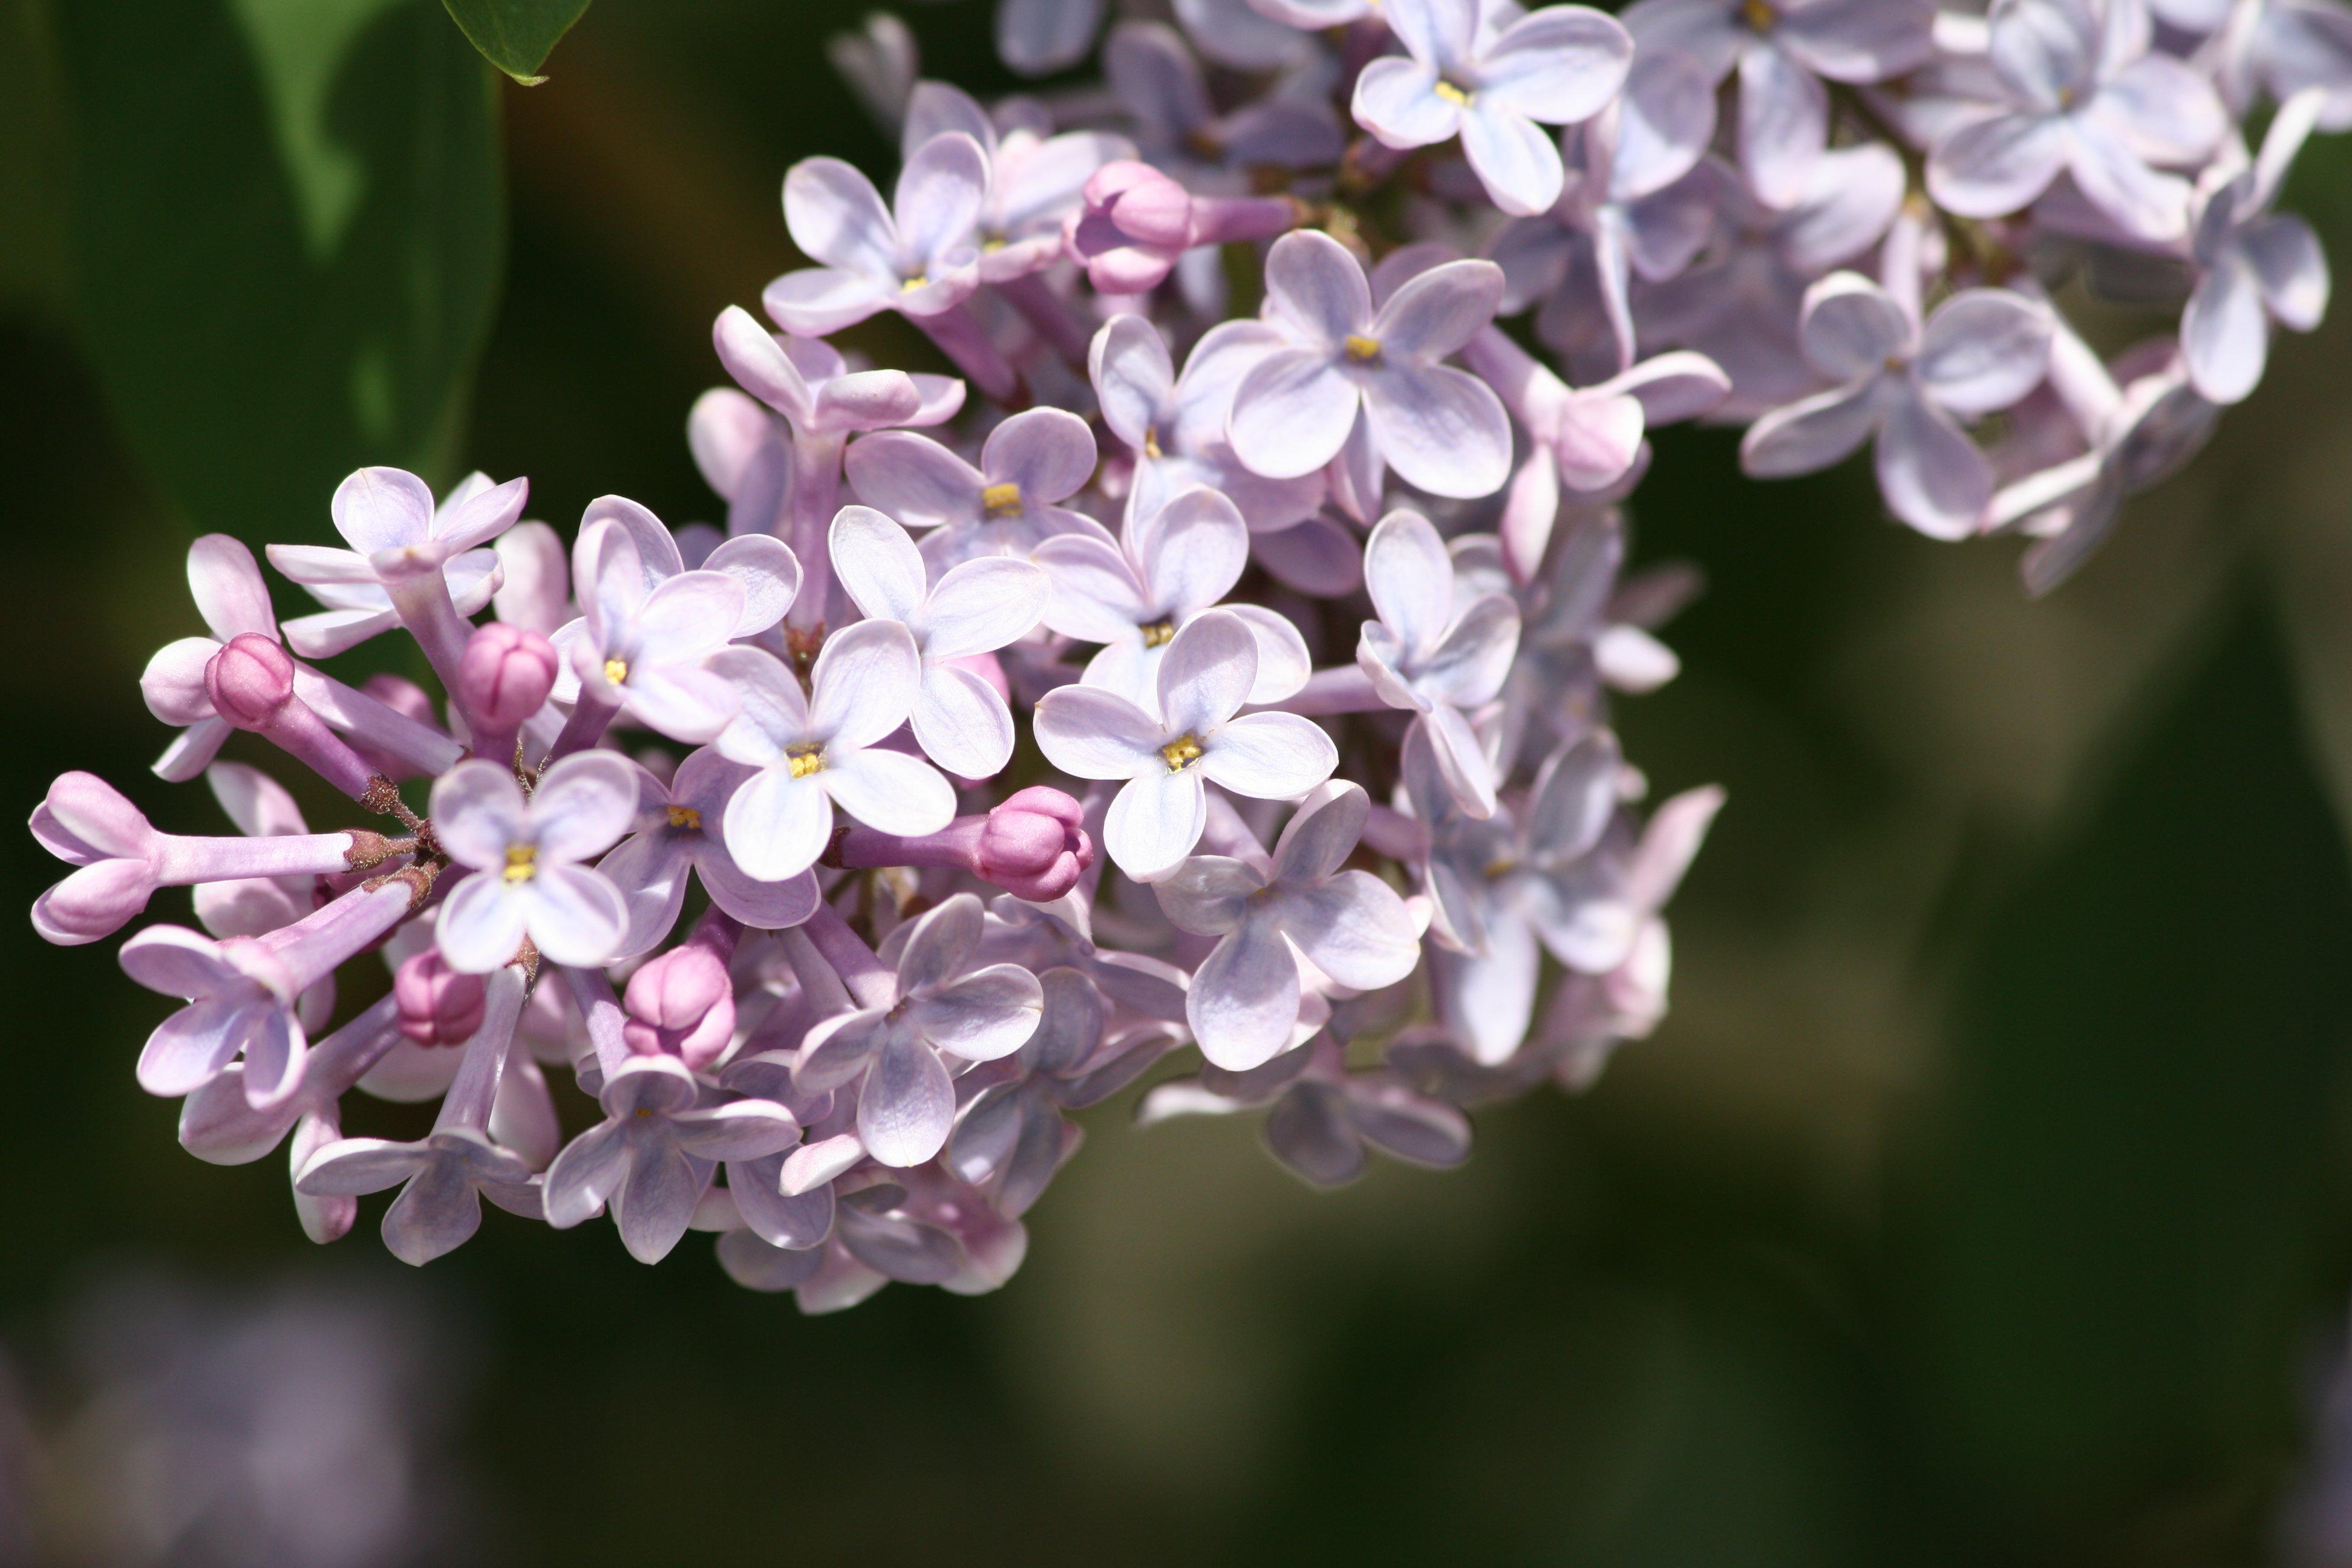 Purple Lilac Blossoms Picture Free Photograph Photos